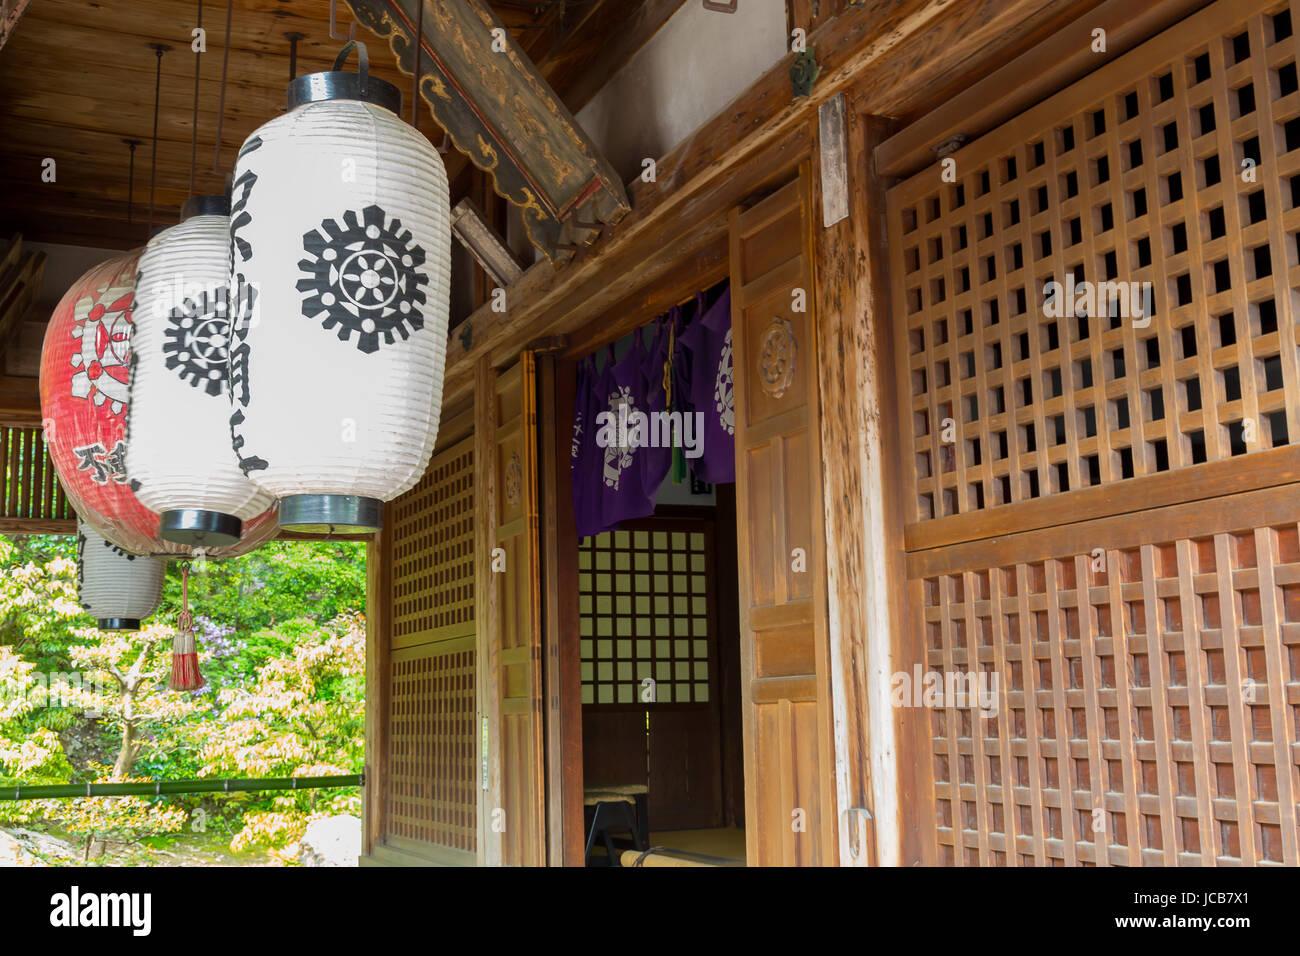 Tempio d'oro, Kinkaku-ji è uno Zen tempio buddista, Kyoto, Giappone. Immagini Stock